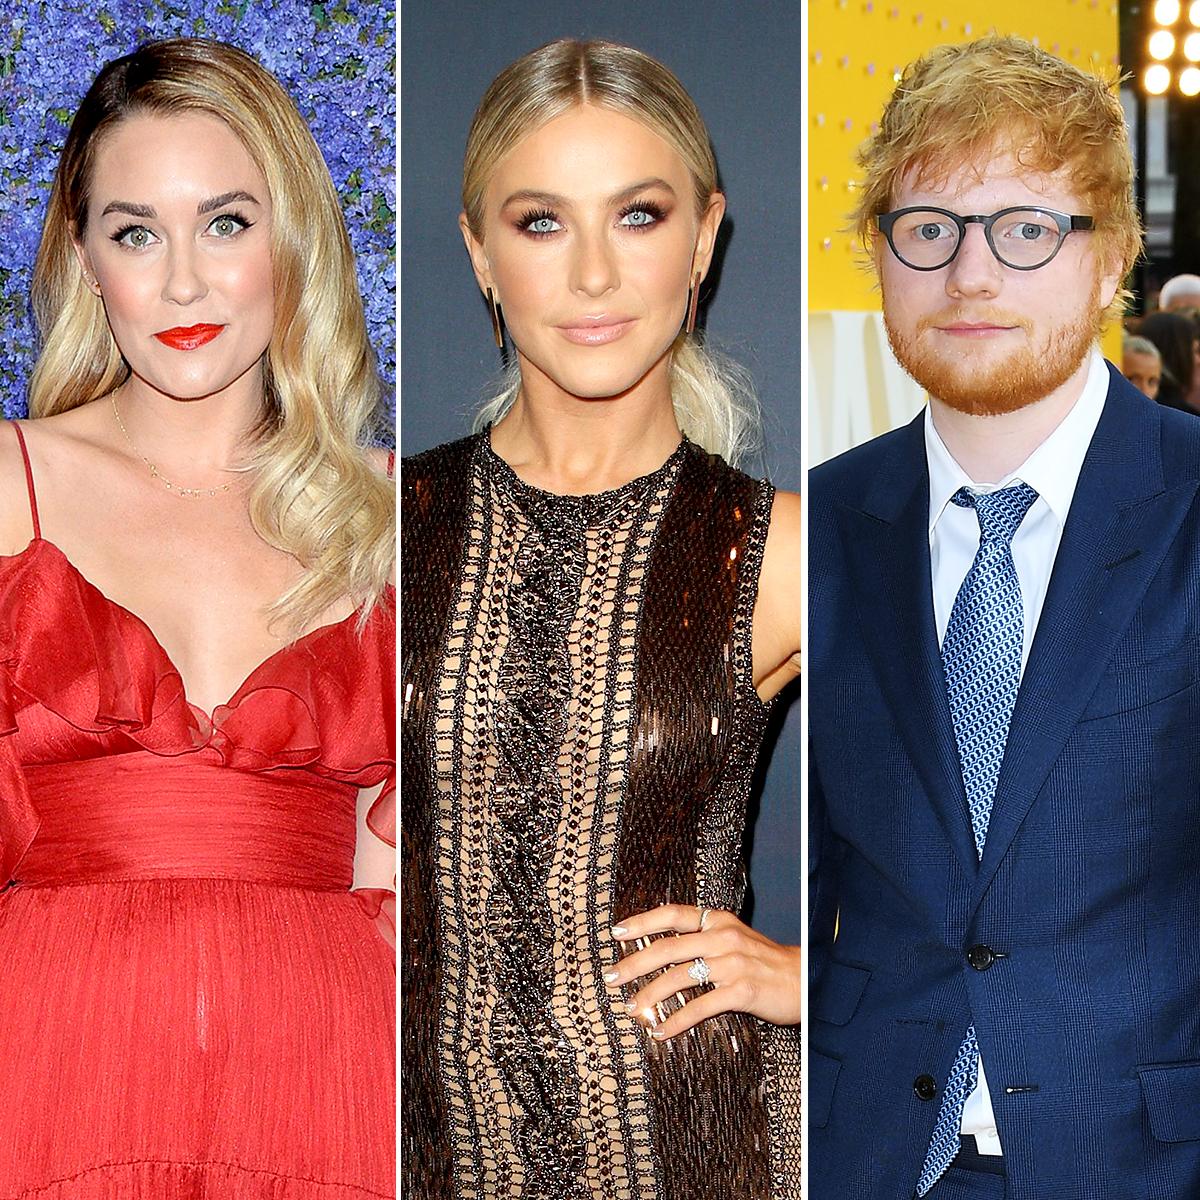 Lauren-Conrad,-Julianne-Hough,-Ed-Sheeran-pets-deaths-2019